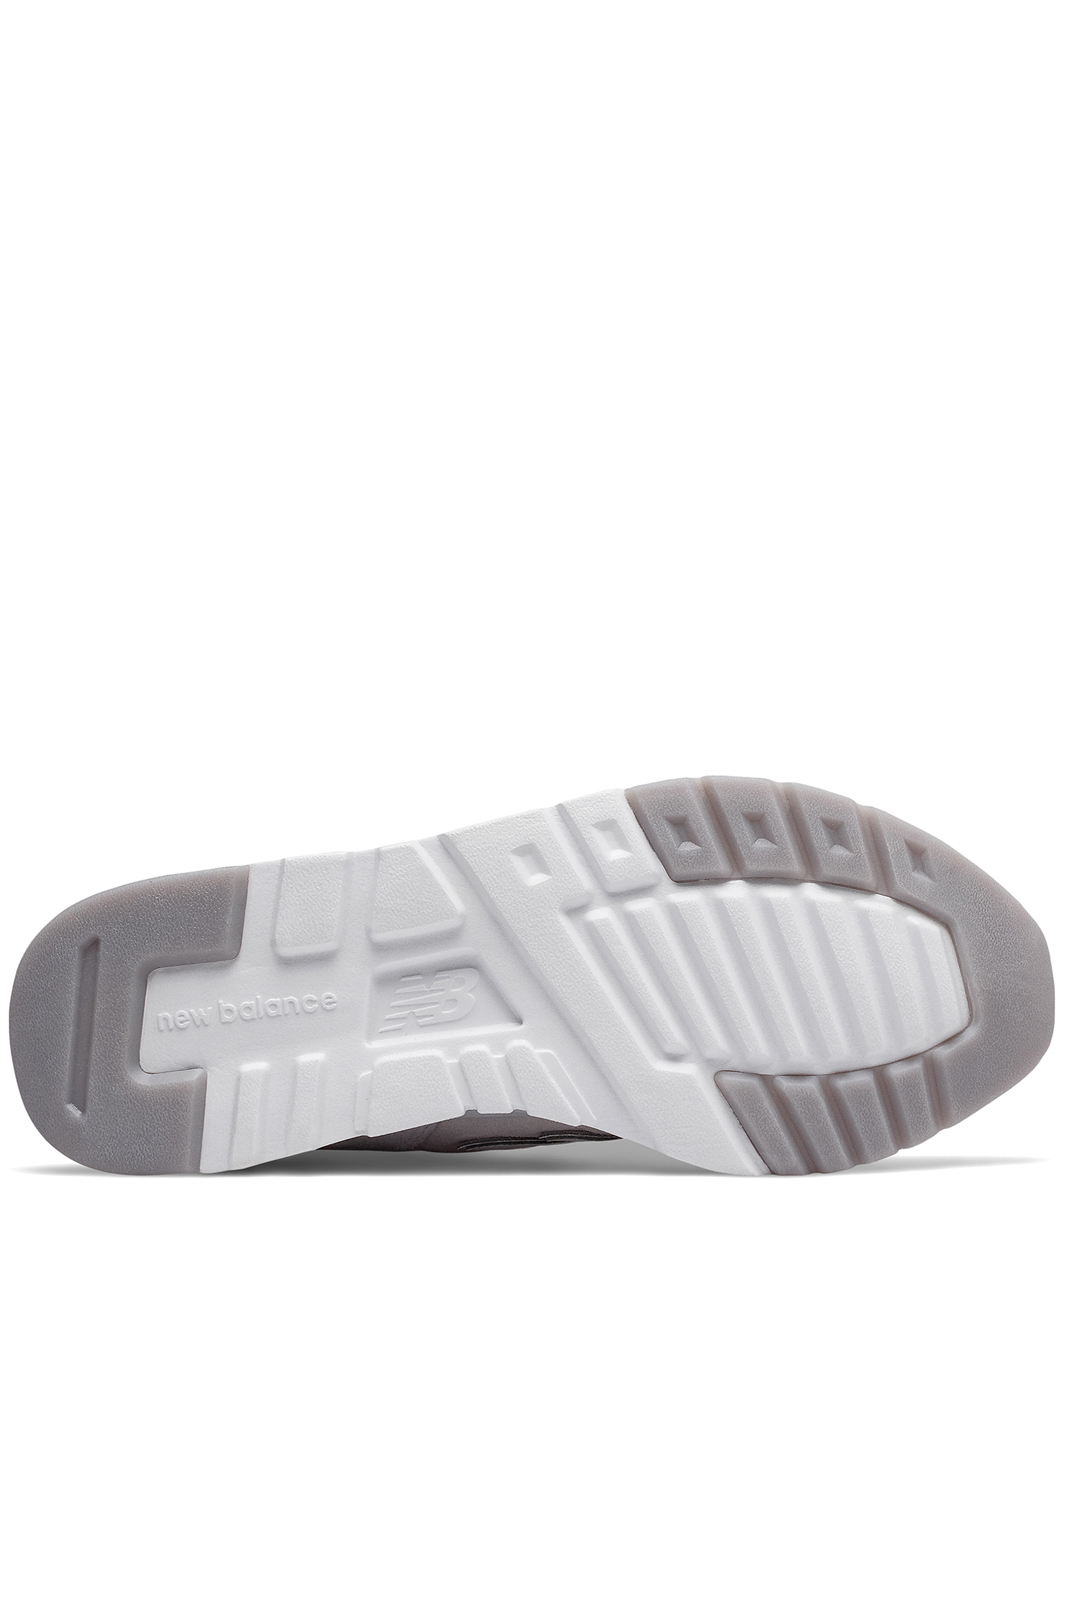 Baskets / Sneakers  New balance CW997HJ BLANC/BEIGE